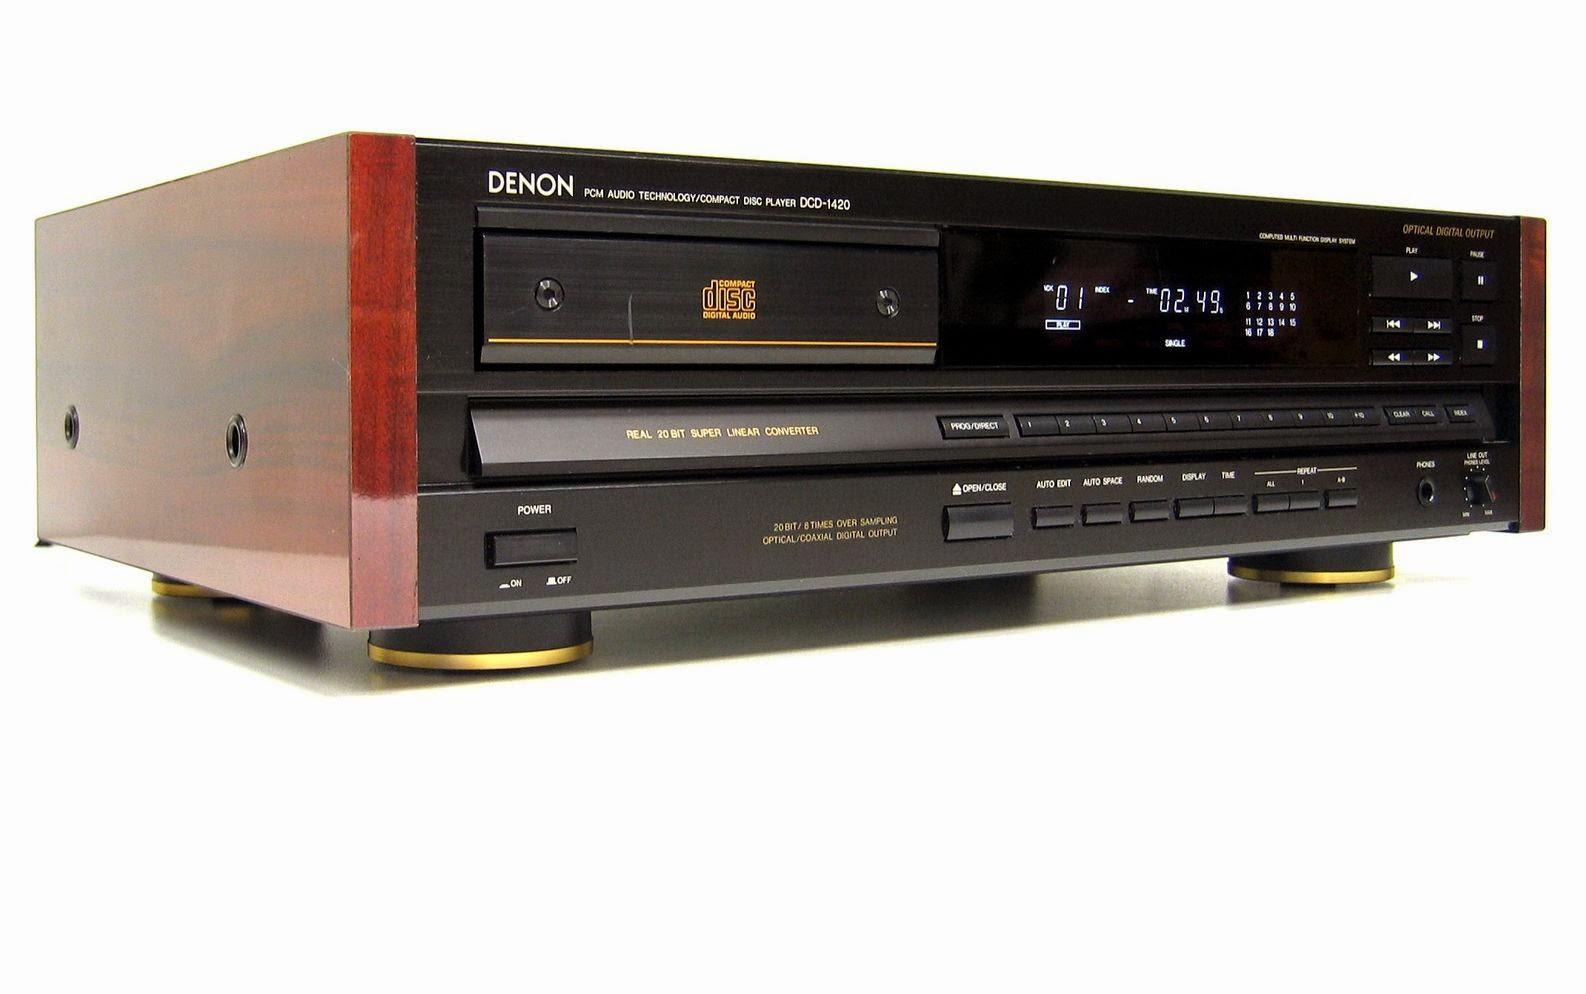 Denon dcd 2000 users manual